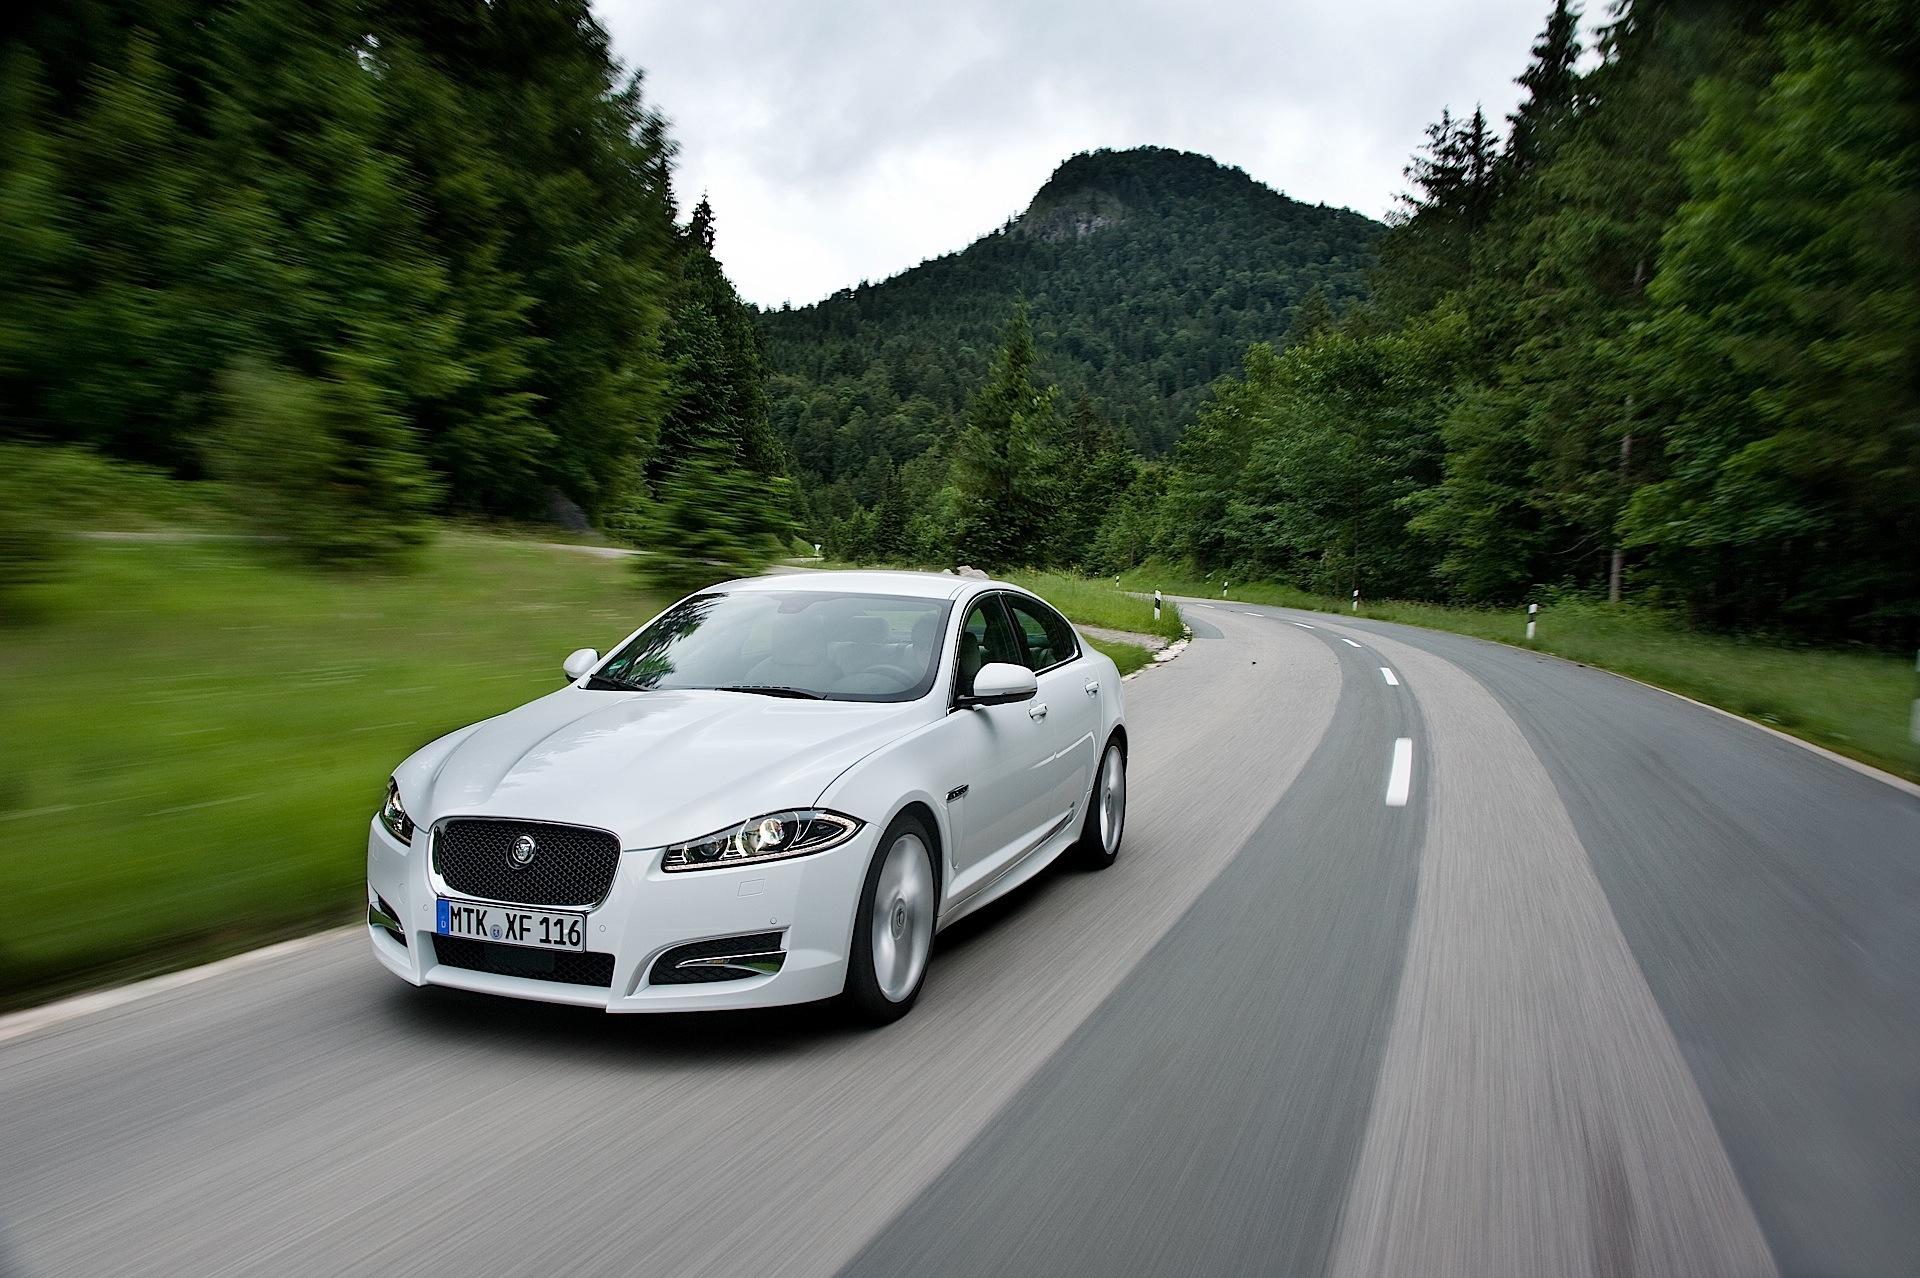 Jaguar Xf Specs Photos 2012 2013 2014 2015 Autoevolution